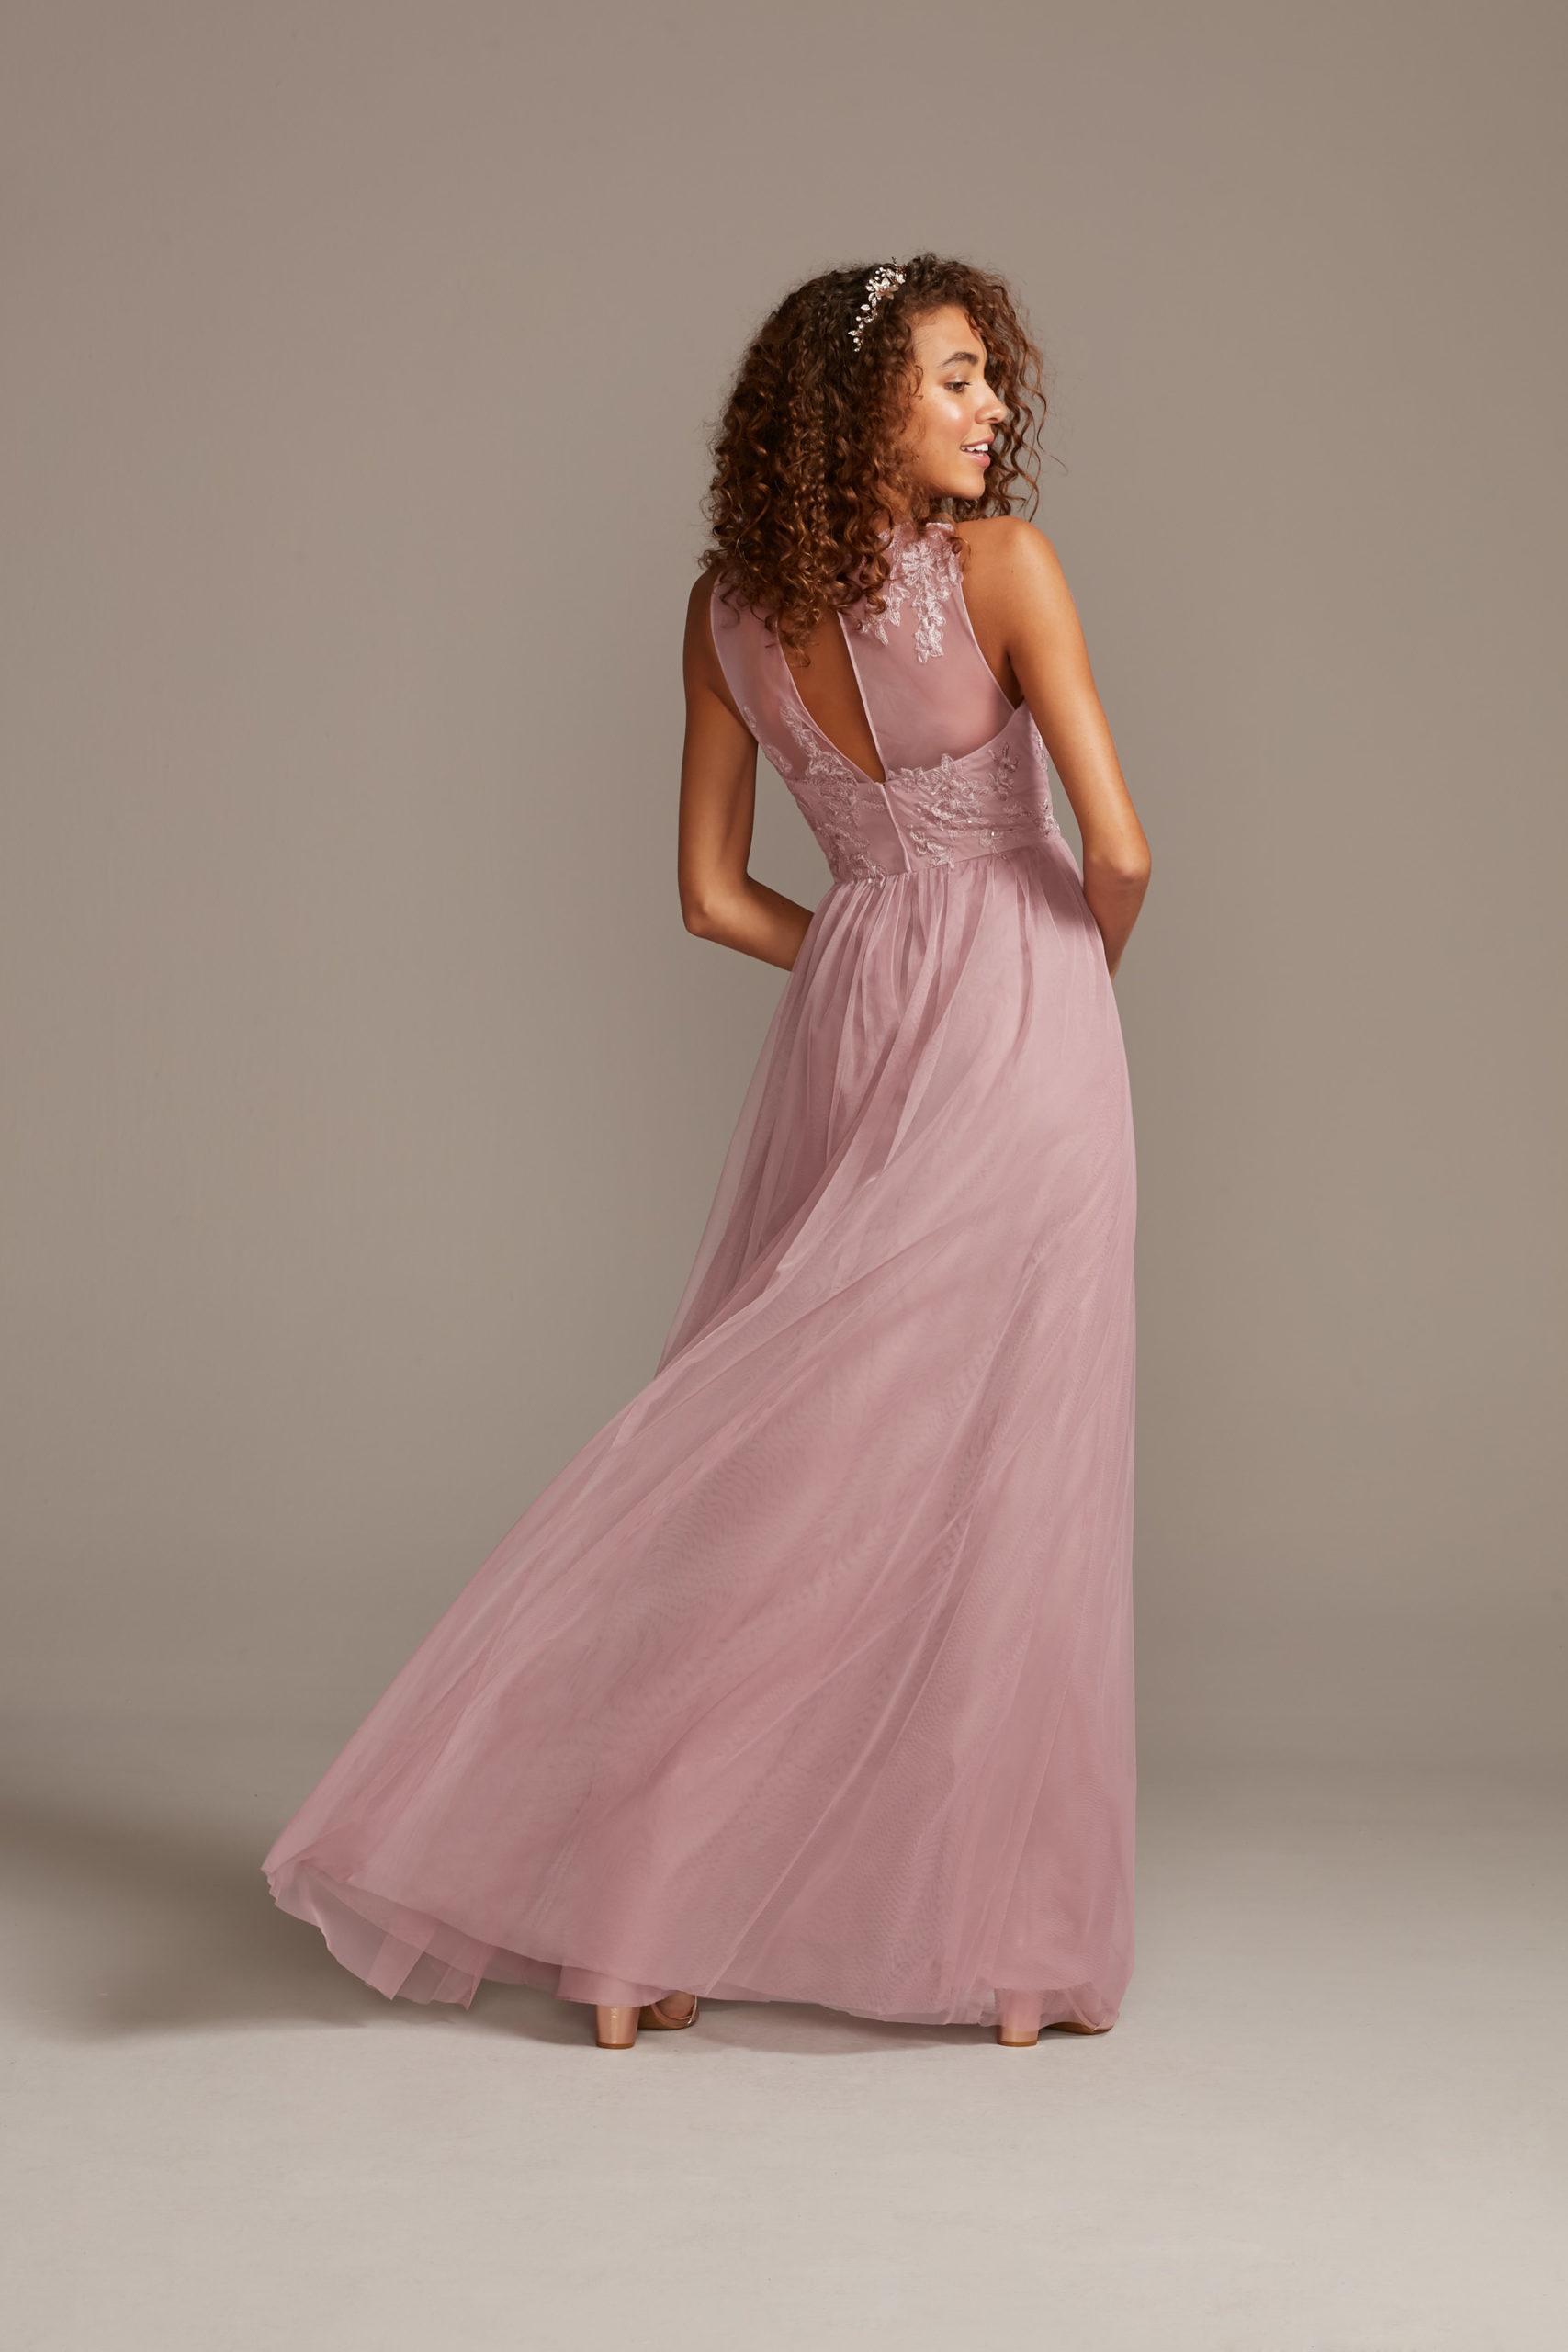 Floral Illusion Neckline Bridesmaid Gown